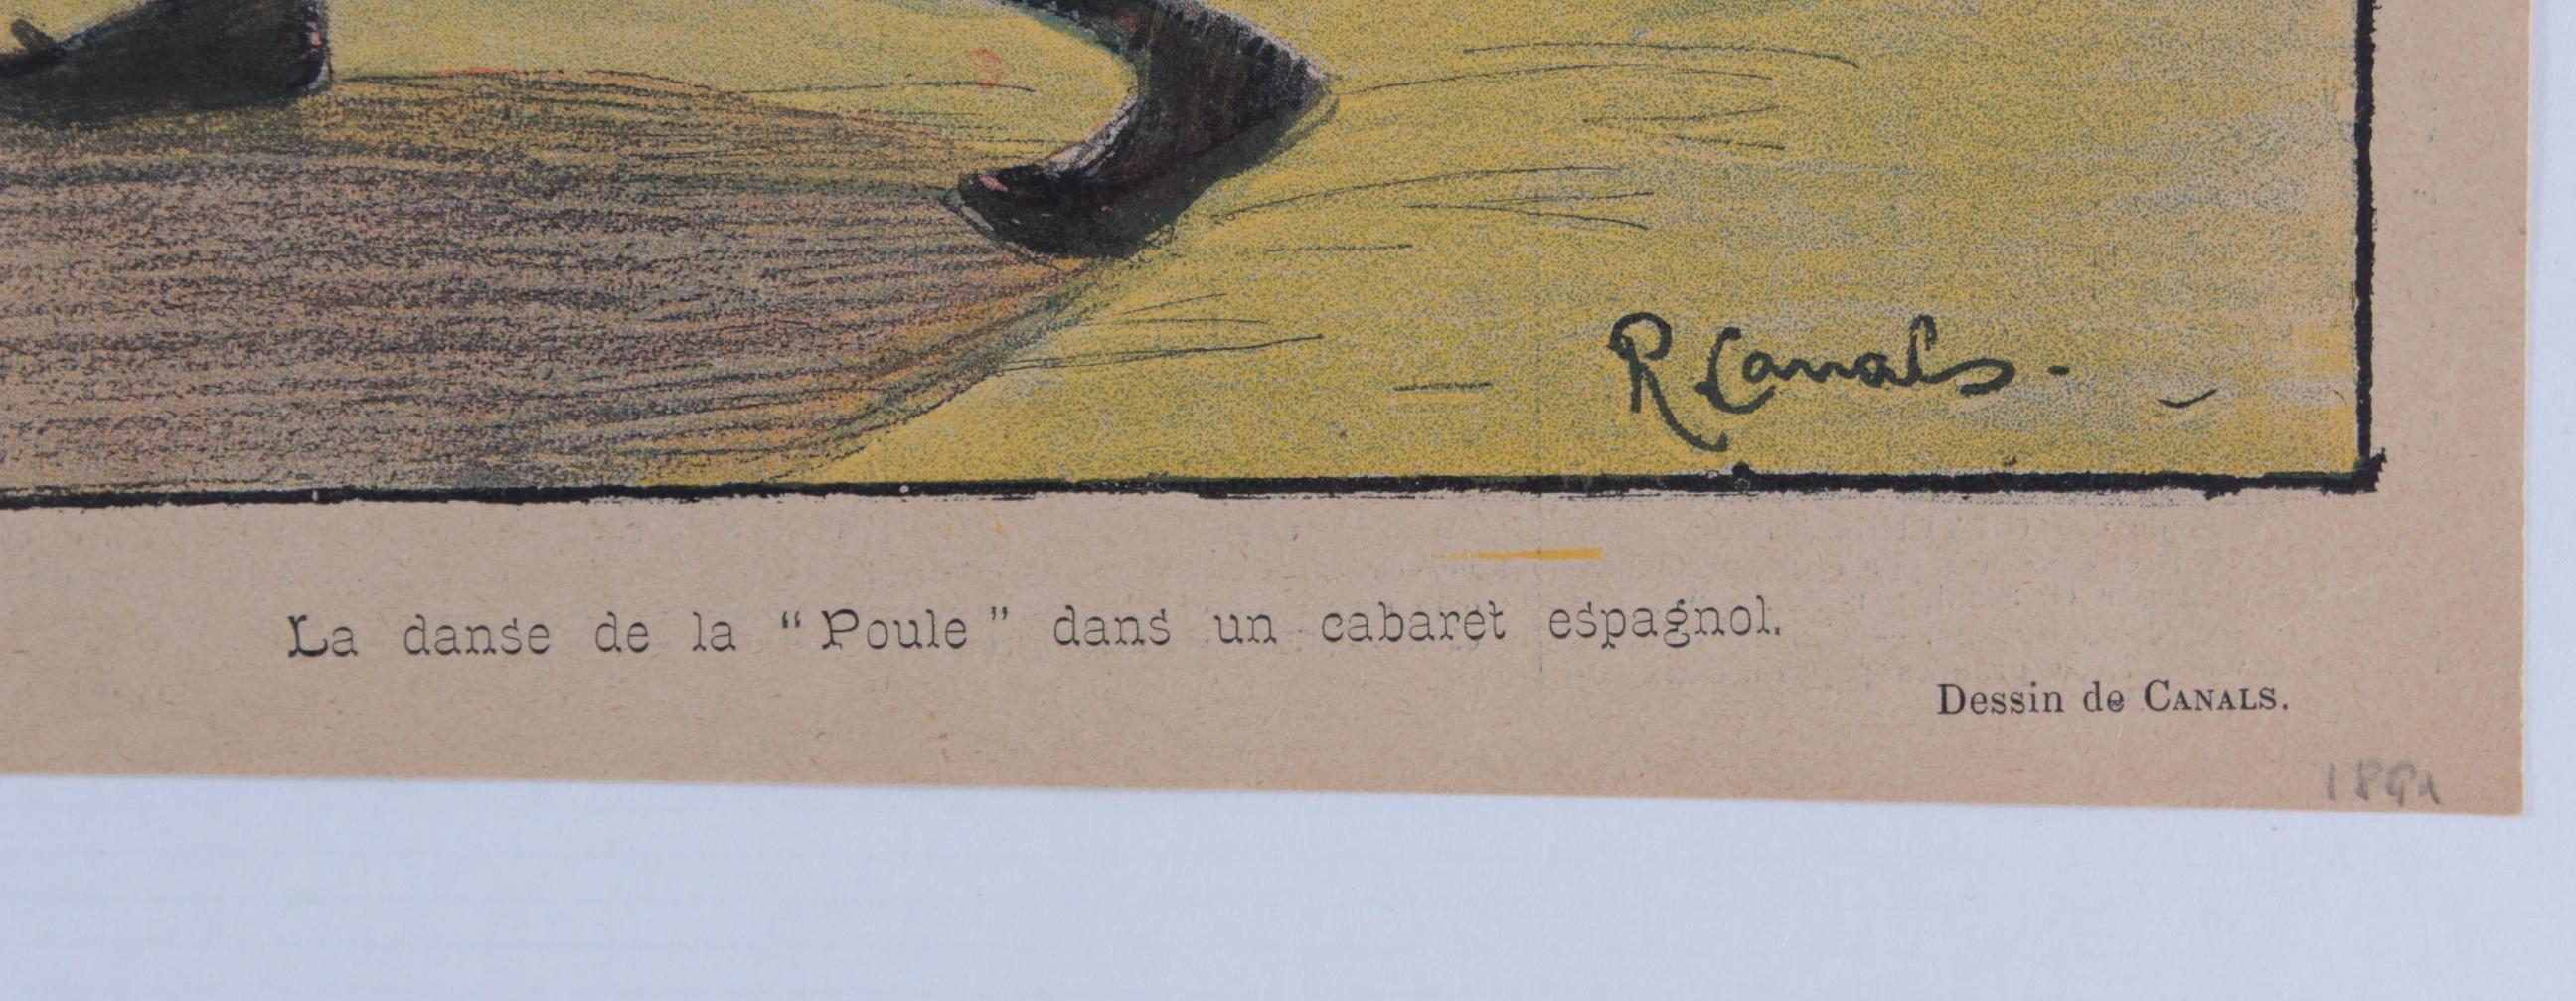 Canals, Ricardo. Spanischer Maler (1876-1931)-3